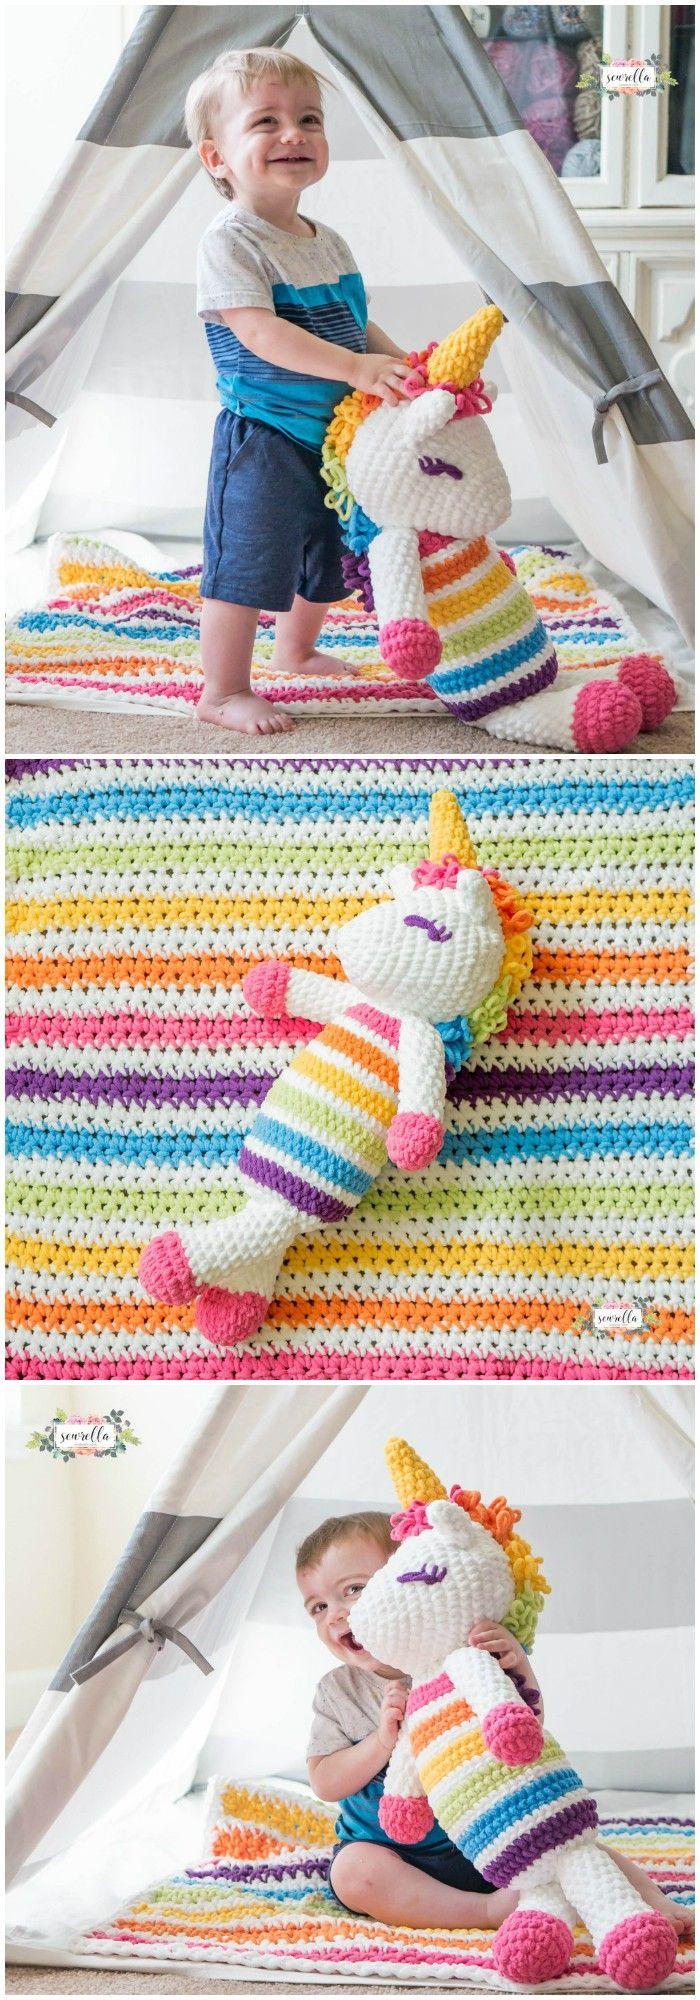 5702 best Crochet away images on Pinterest | Knit crochet, Crochet ...